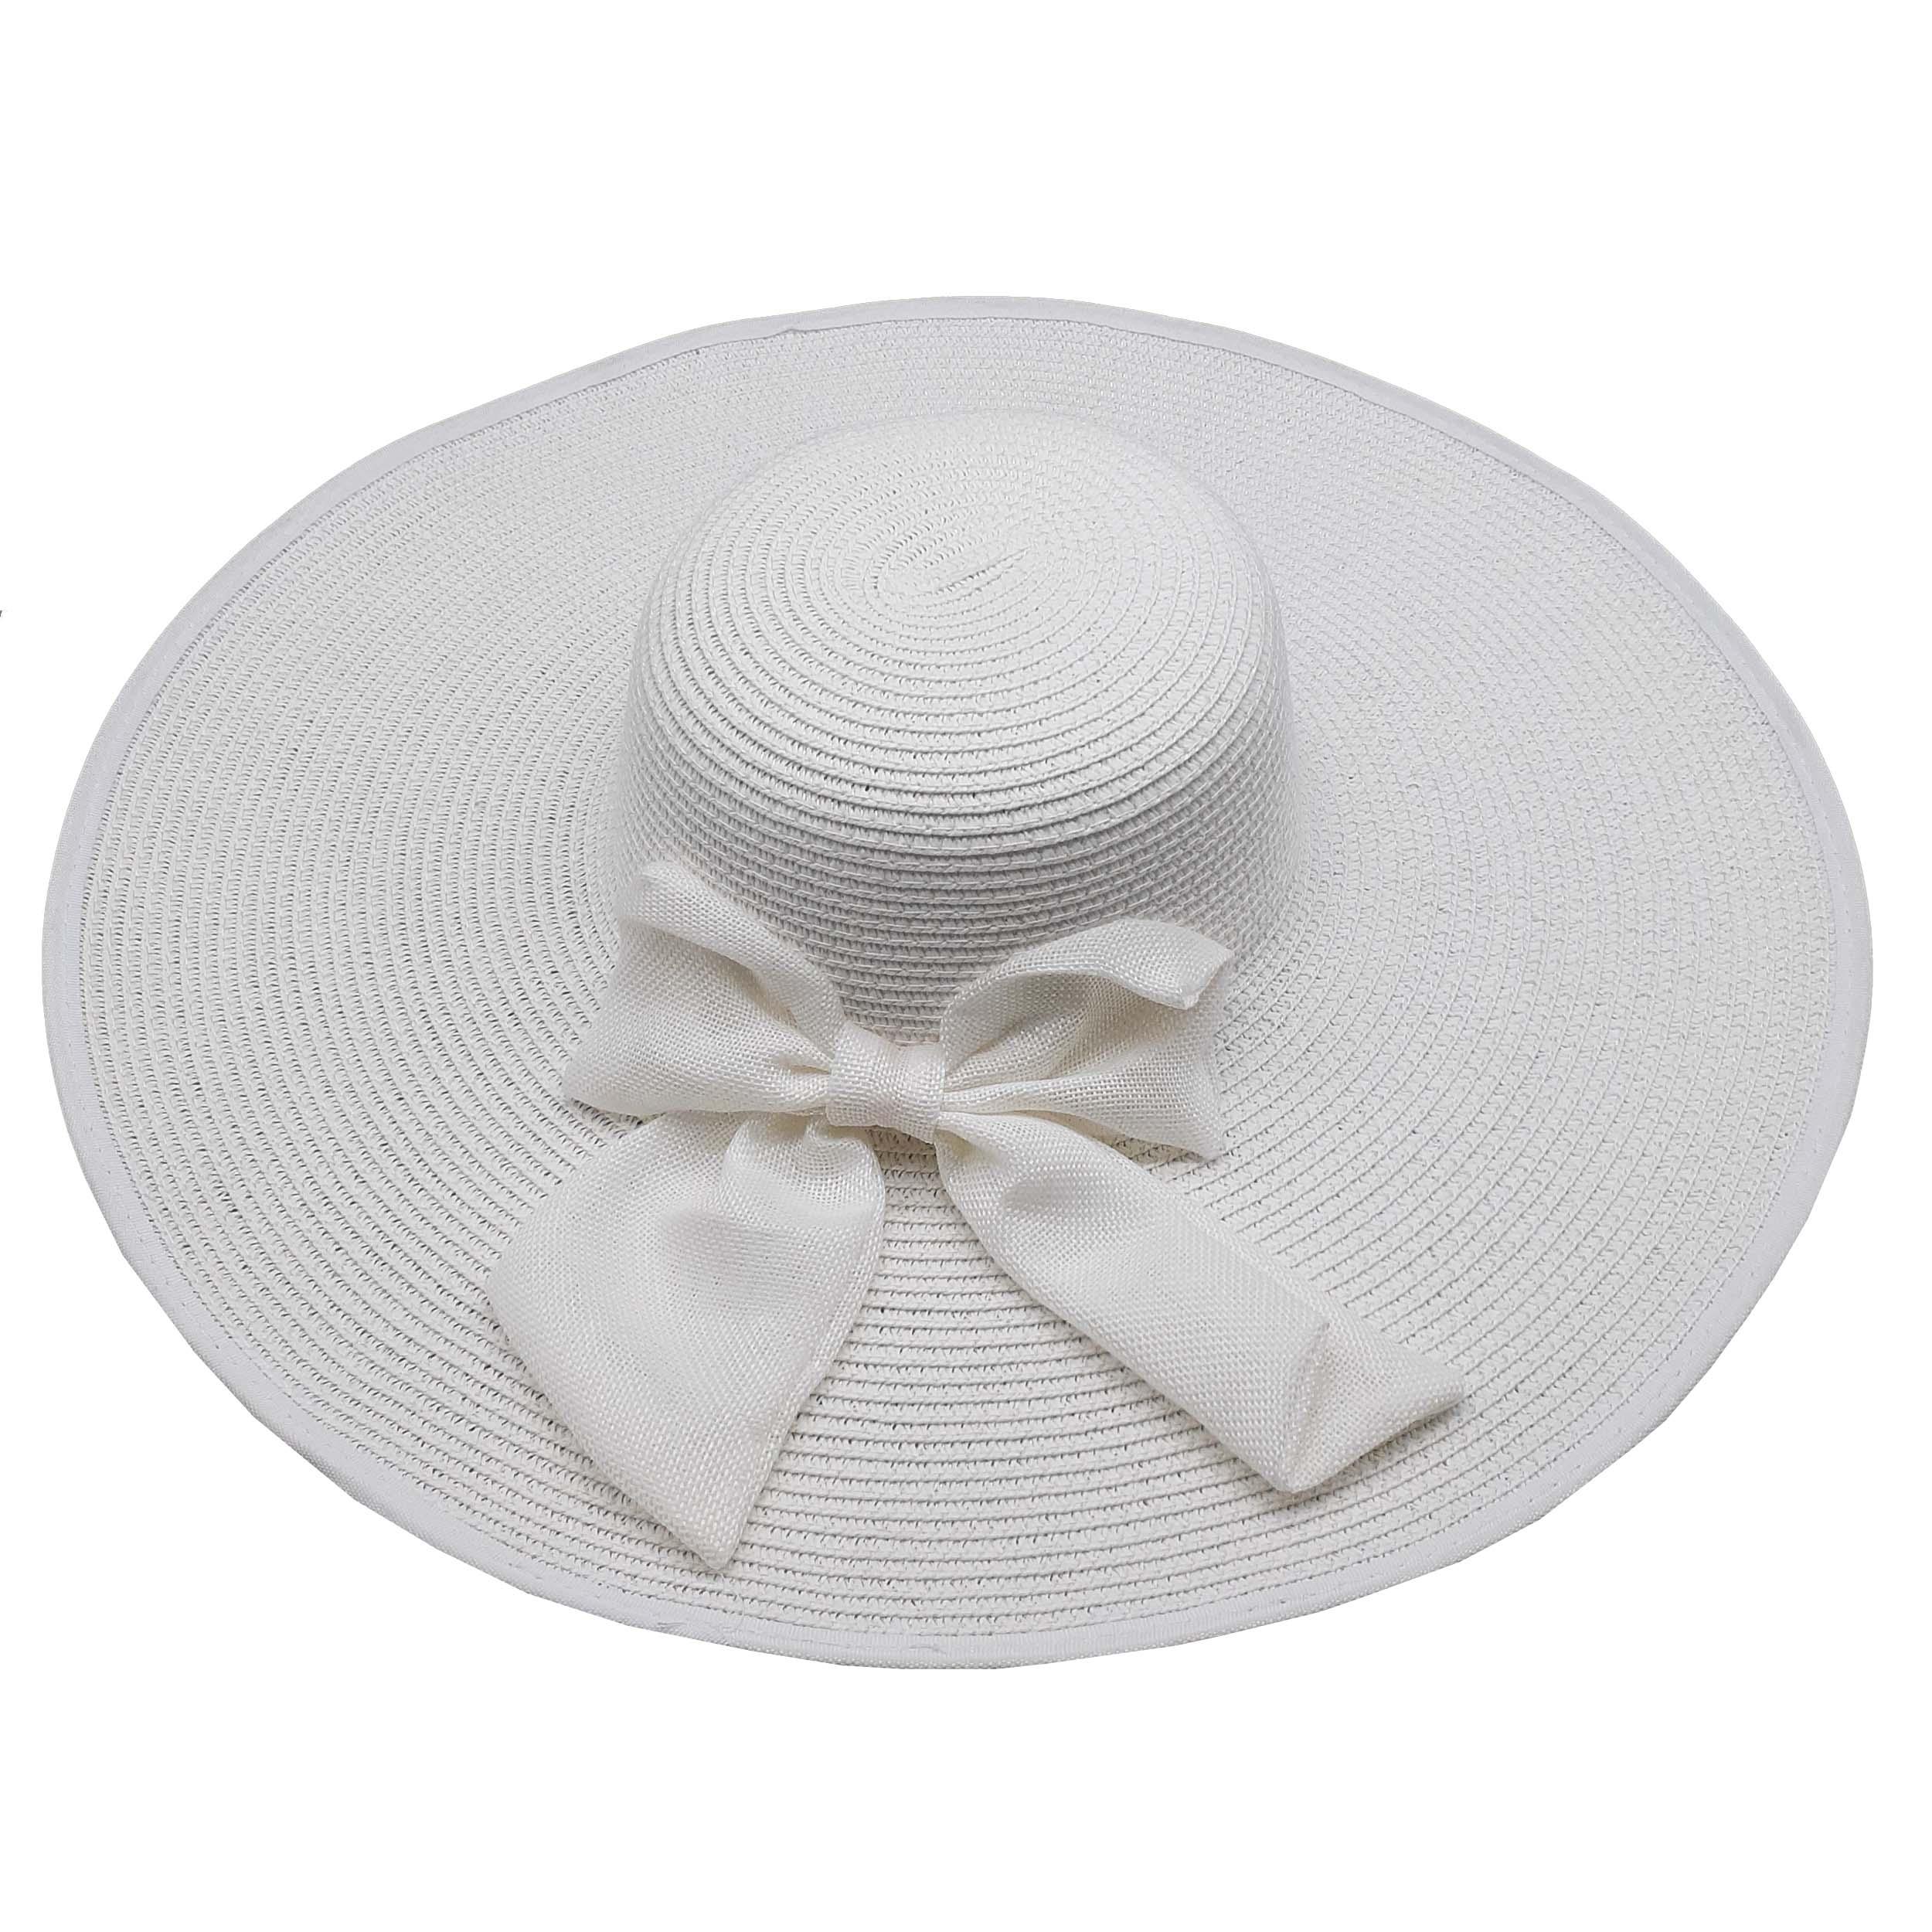 کلاه زنانه کد 1668 c